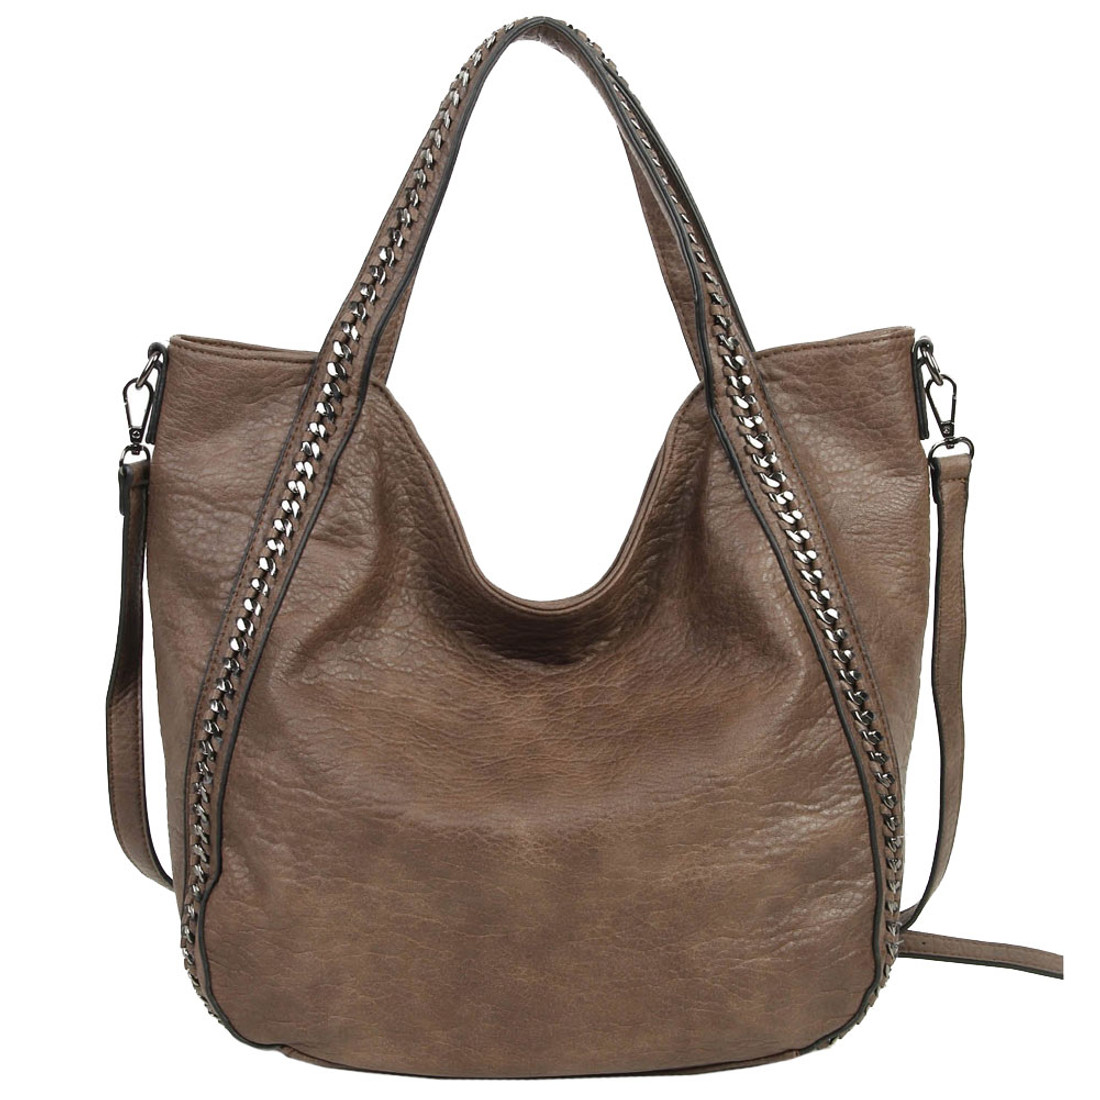 The Daphne Brown Purse Bohemian Tote Crossbody Shoulder Bag